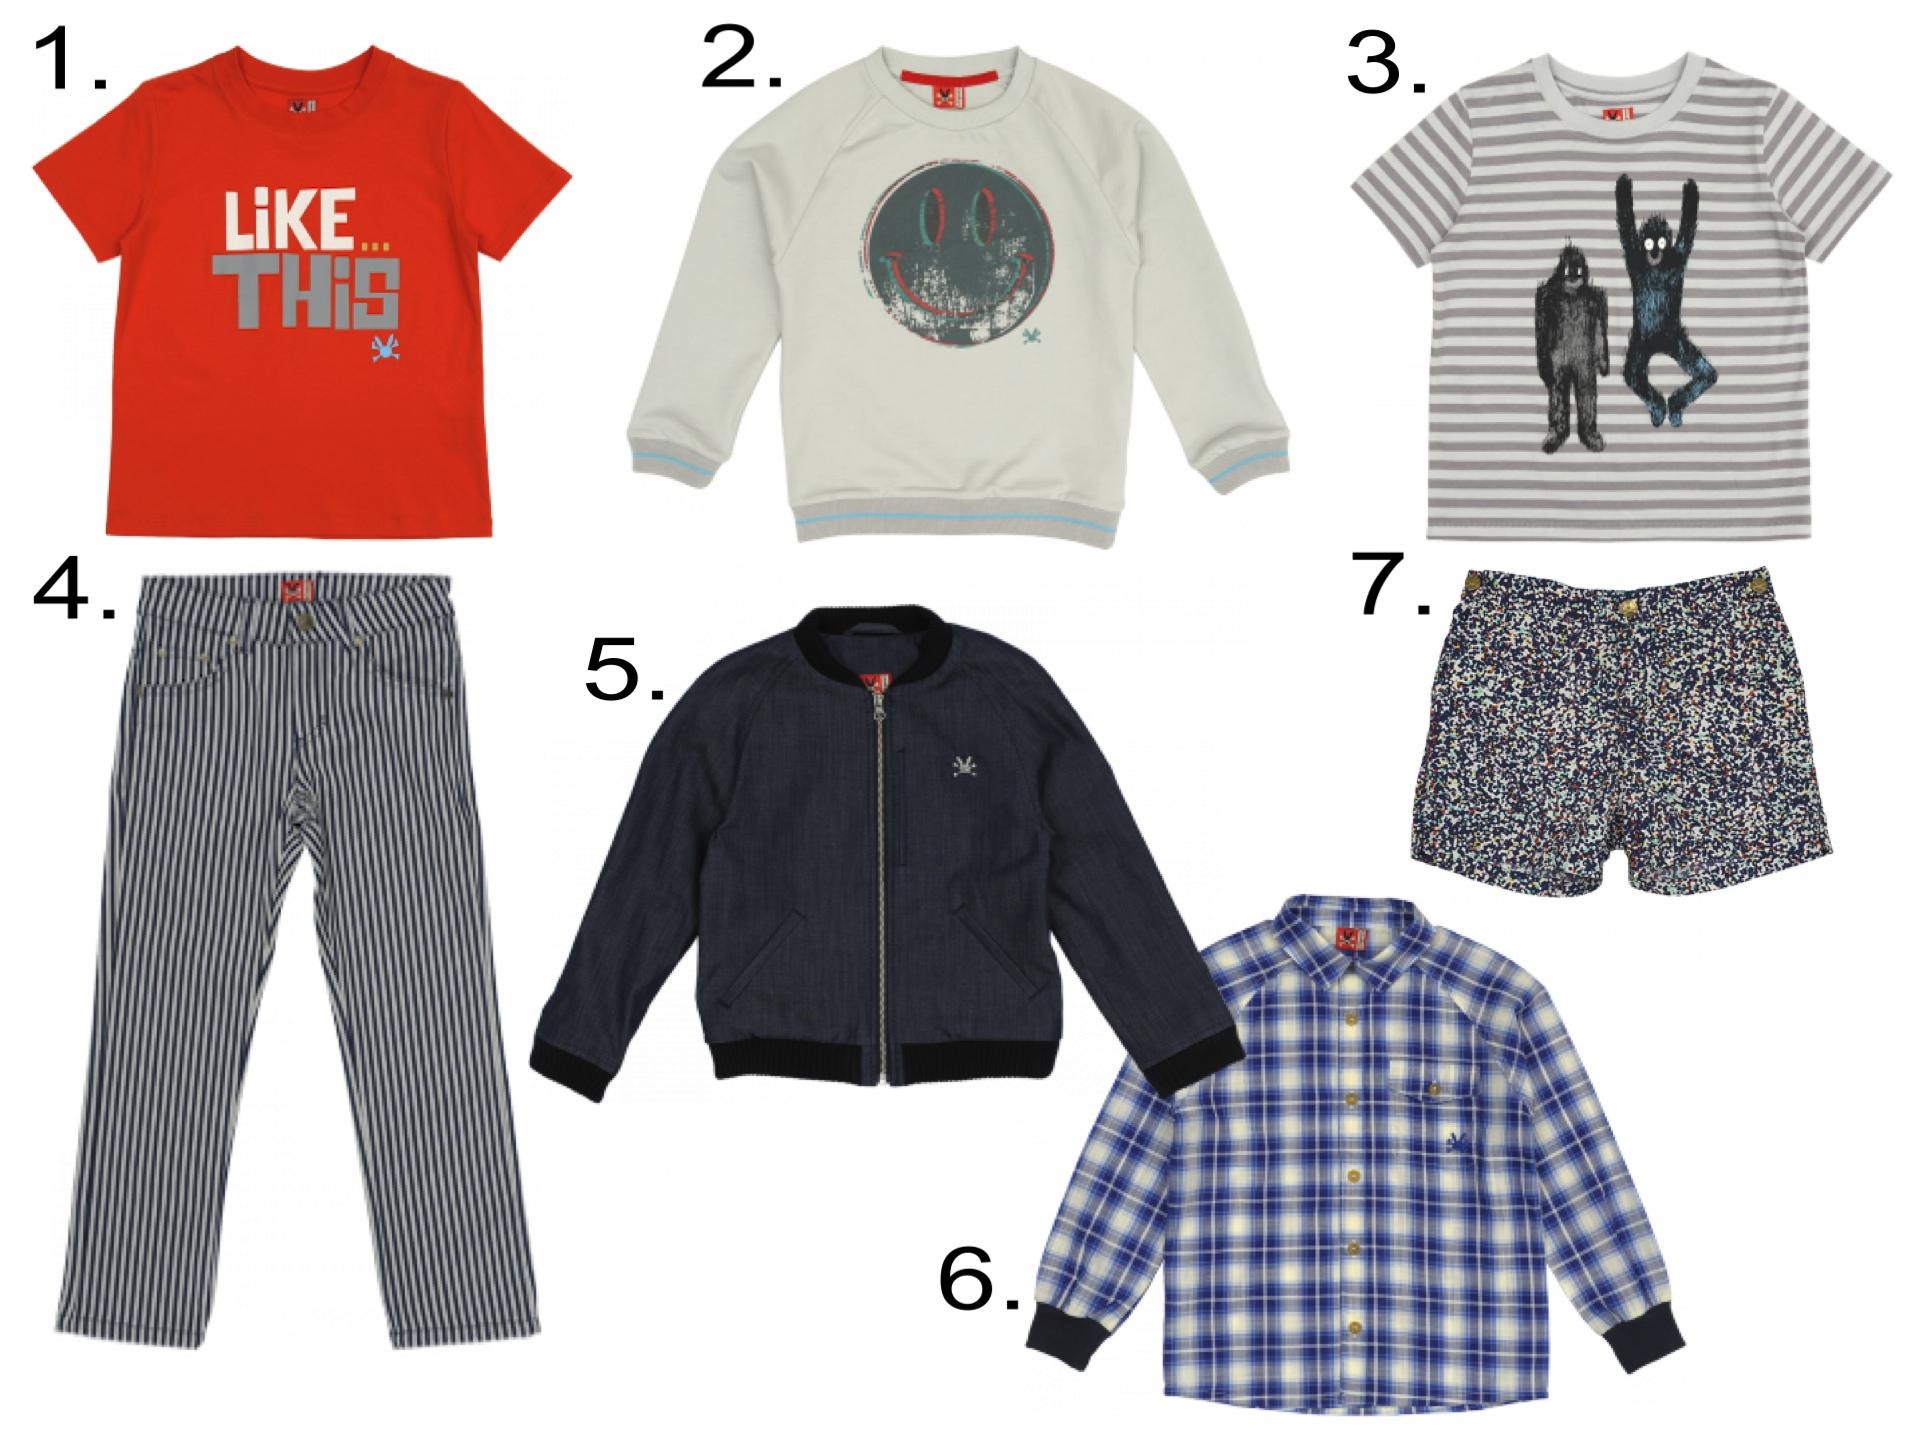 Favorite Boys' Sale @  noaddedsugar.com   1.  Like This T-Shirt   2.  Good Trip Sweatshirt  3.  Shaggy Monster T-Shirt  4.  Stripe Pants  5.  Buffalo Stance Jacket  6.  Picnic Check Shirt  7.  Liberty Shorts